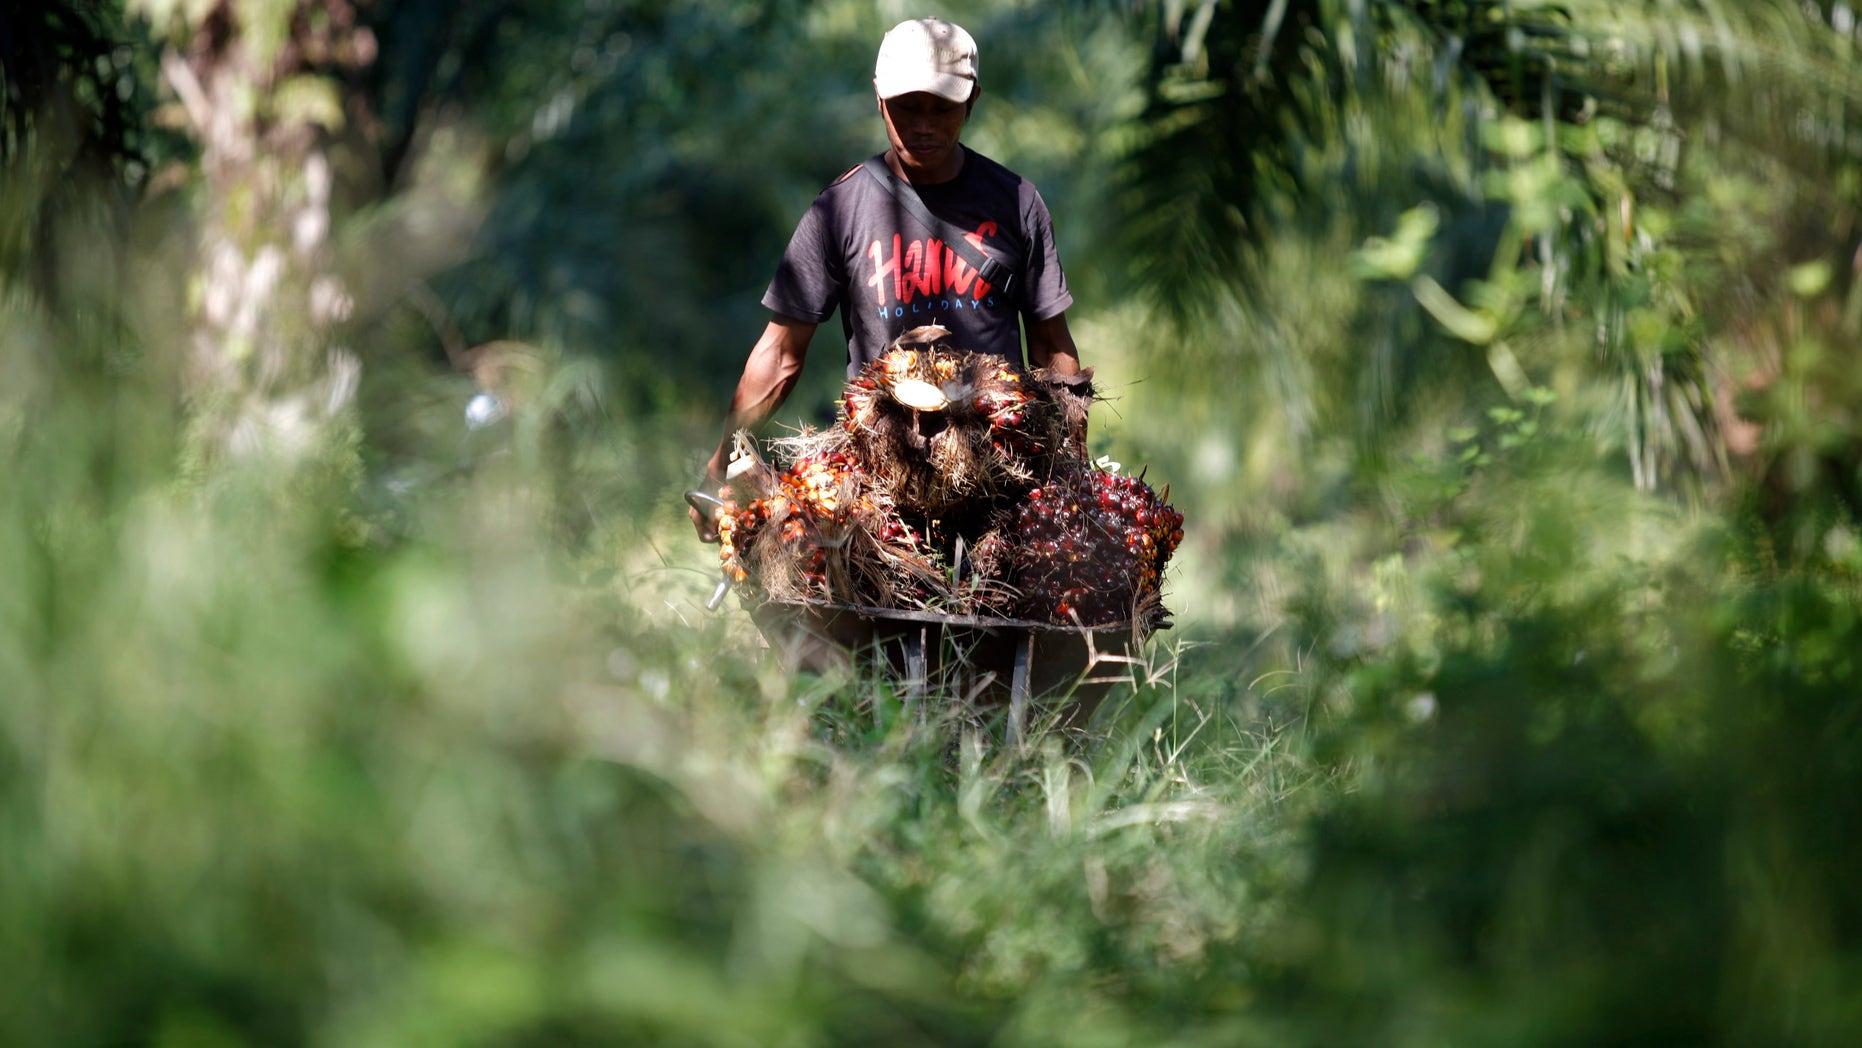 A worker collects oil palm fruits at a plantation in Sepang outside Kuala Lumpur November 3, 2009. (REUTERS/Bazuki Muhammad)